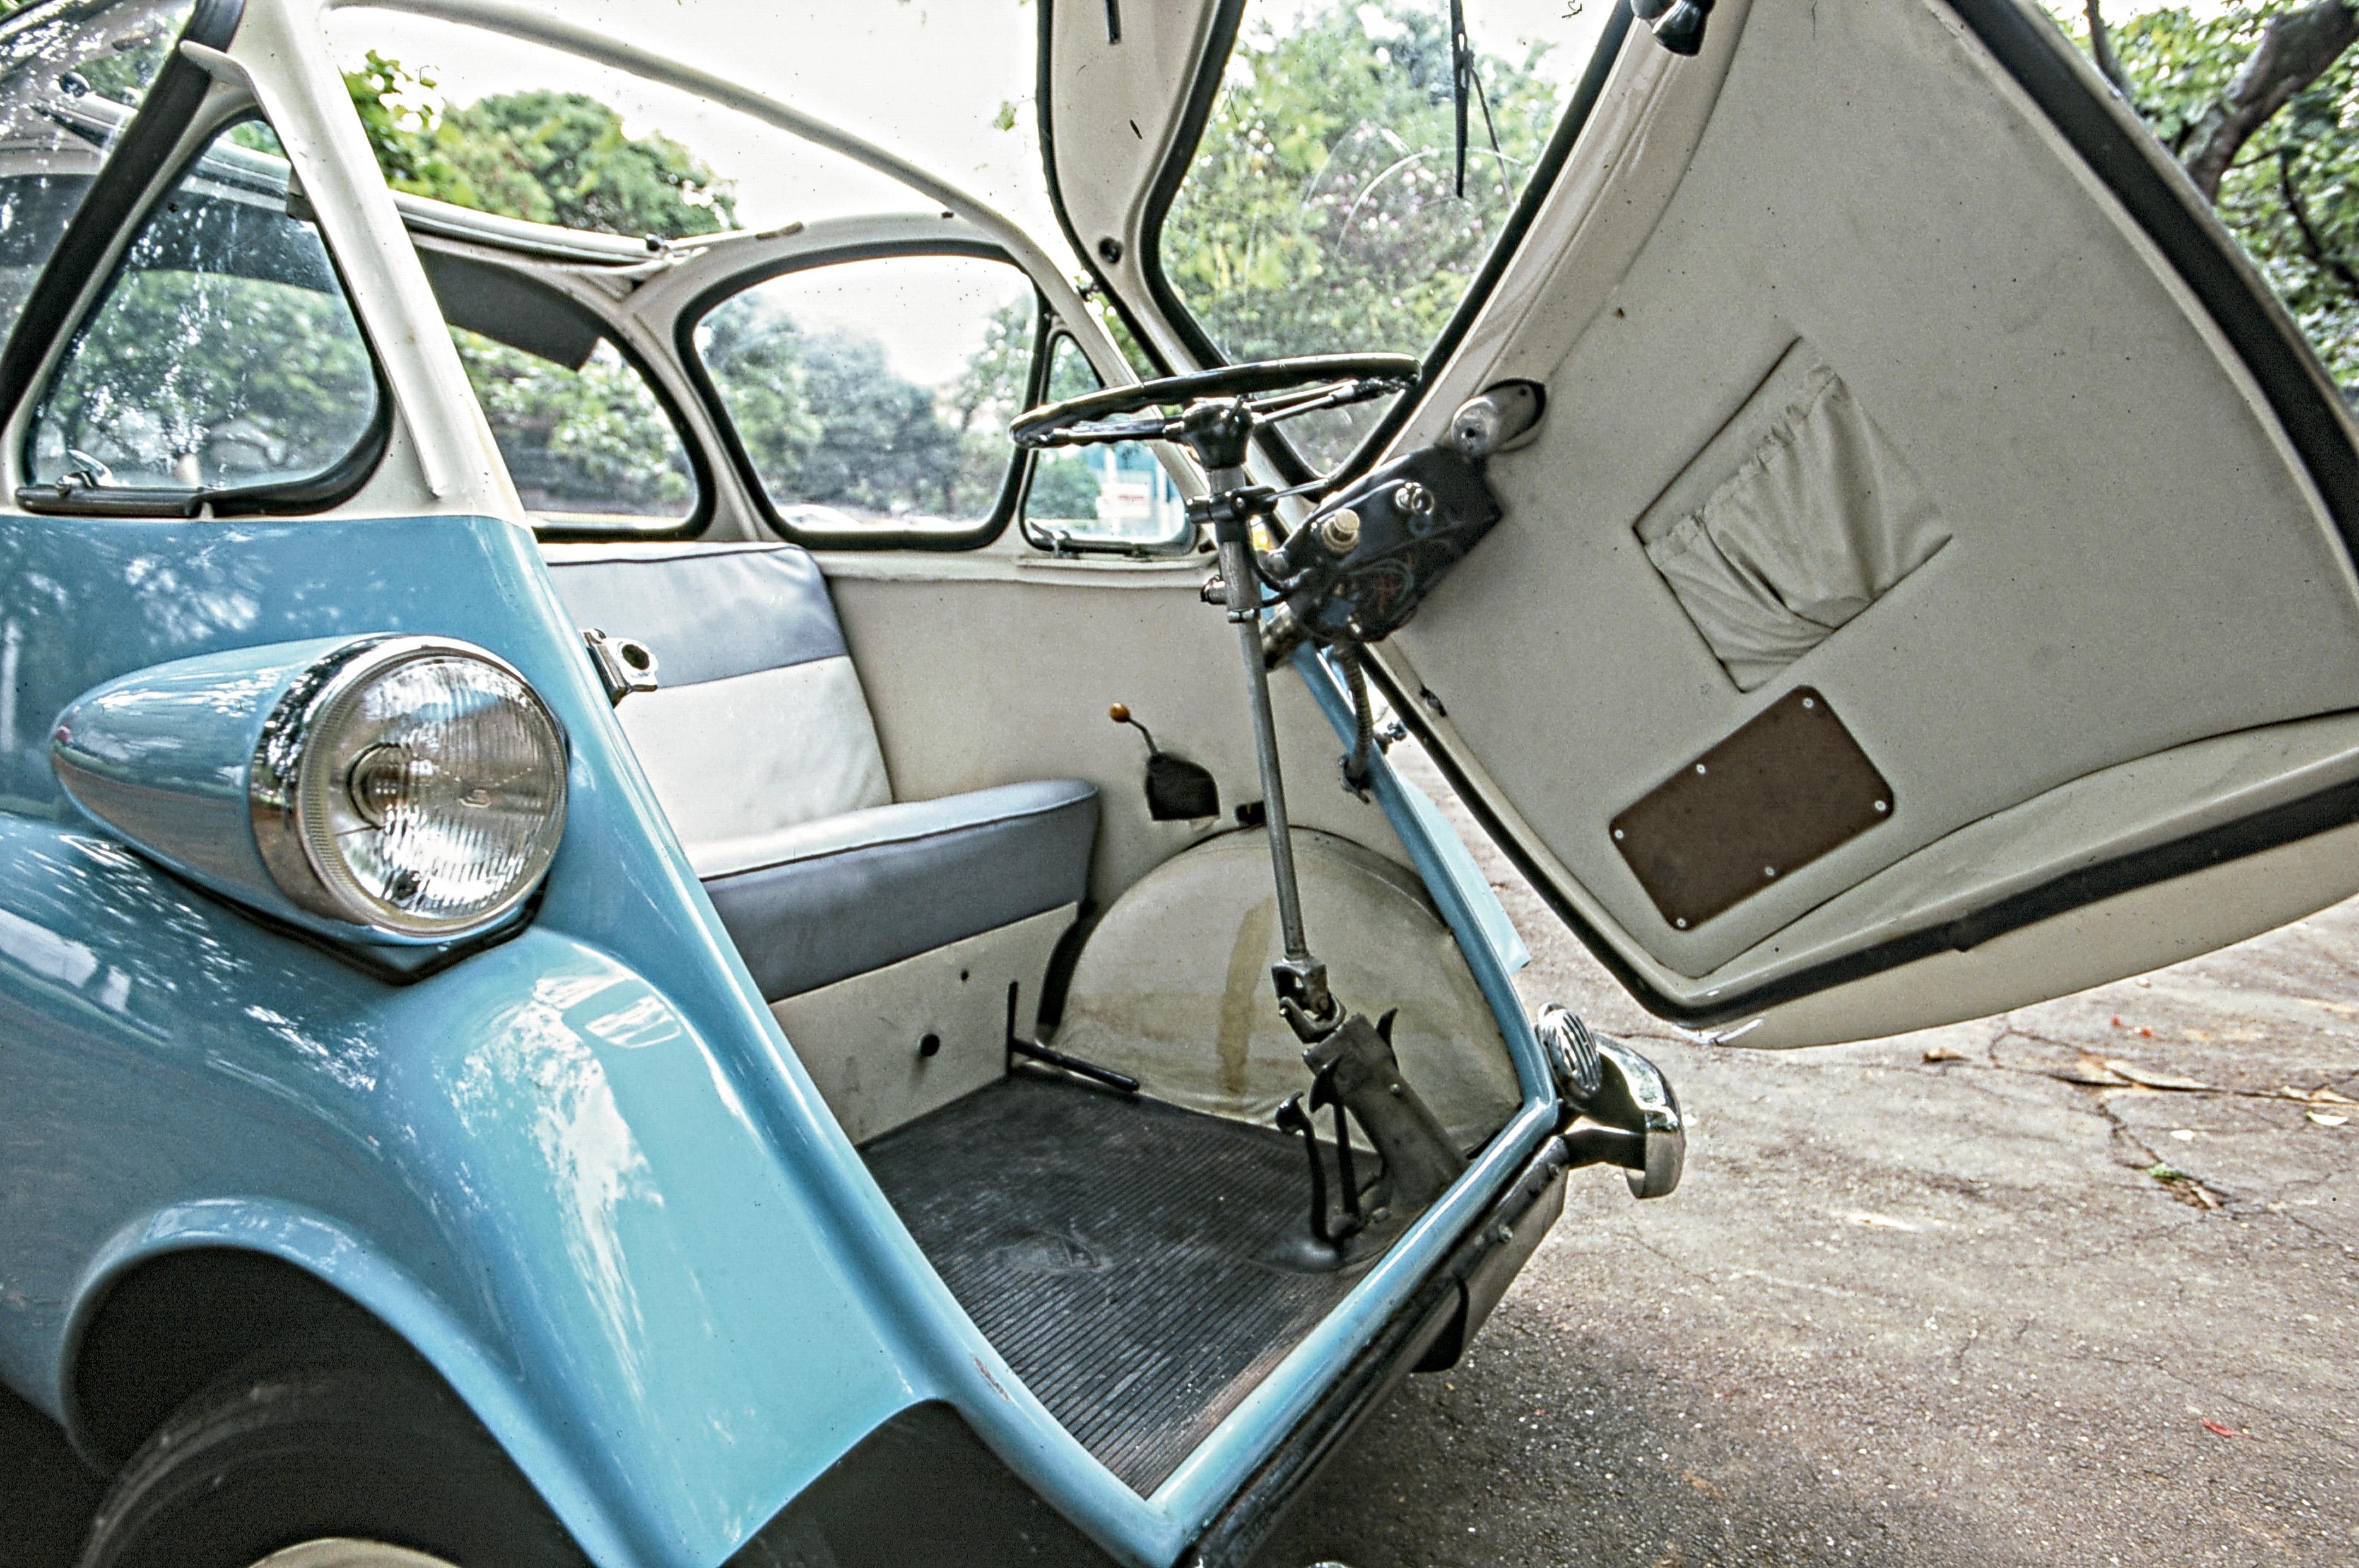 Romi Isetta azul visto de frente com a porta aberta